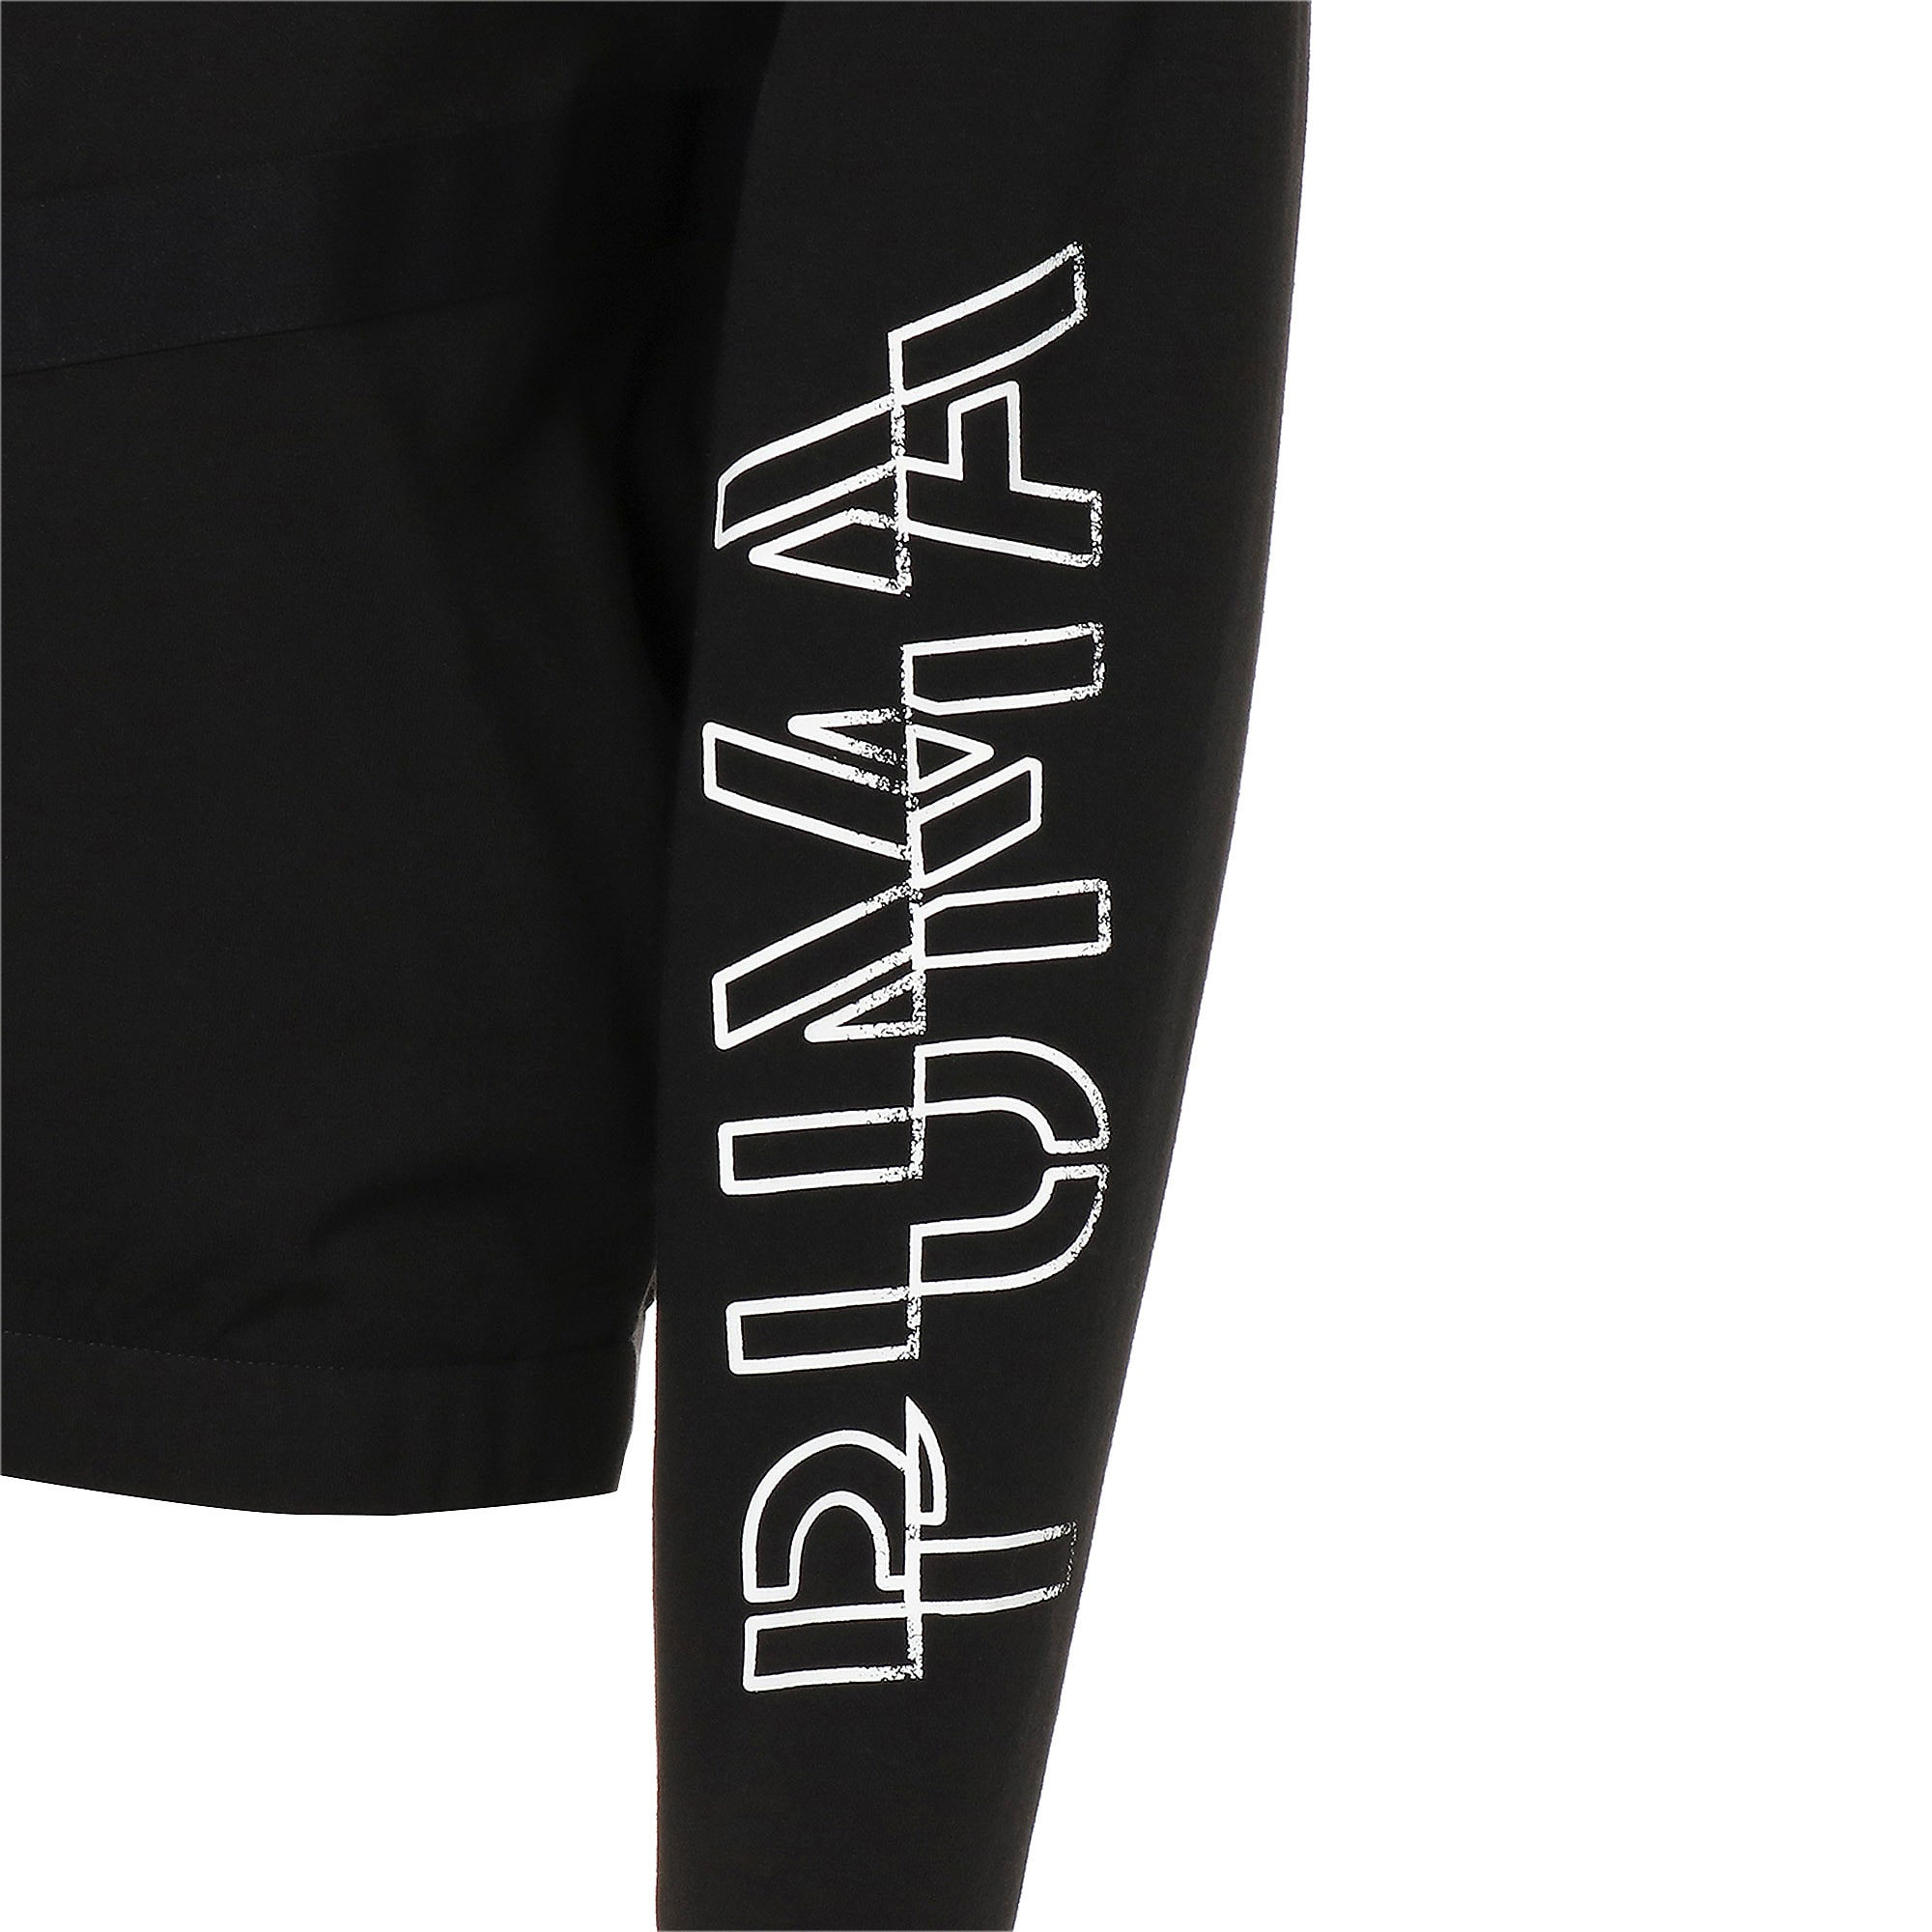 Thumbnail 11 of フィール イット ウィメンズ トレーニング スウェットジャケット, Puma Black, medium-JPN